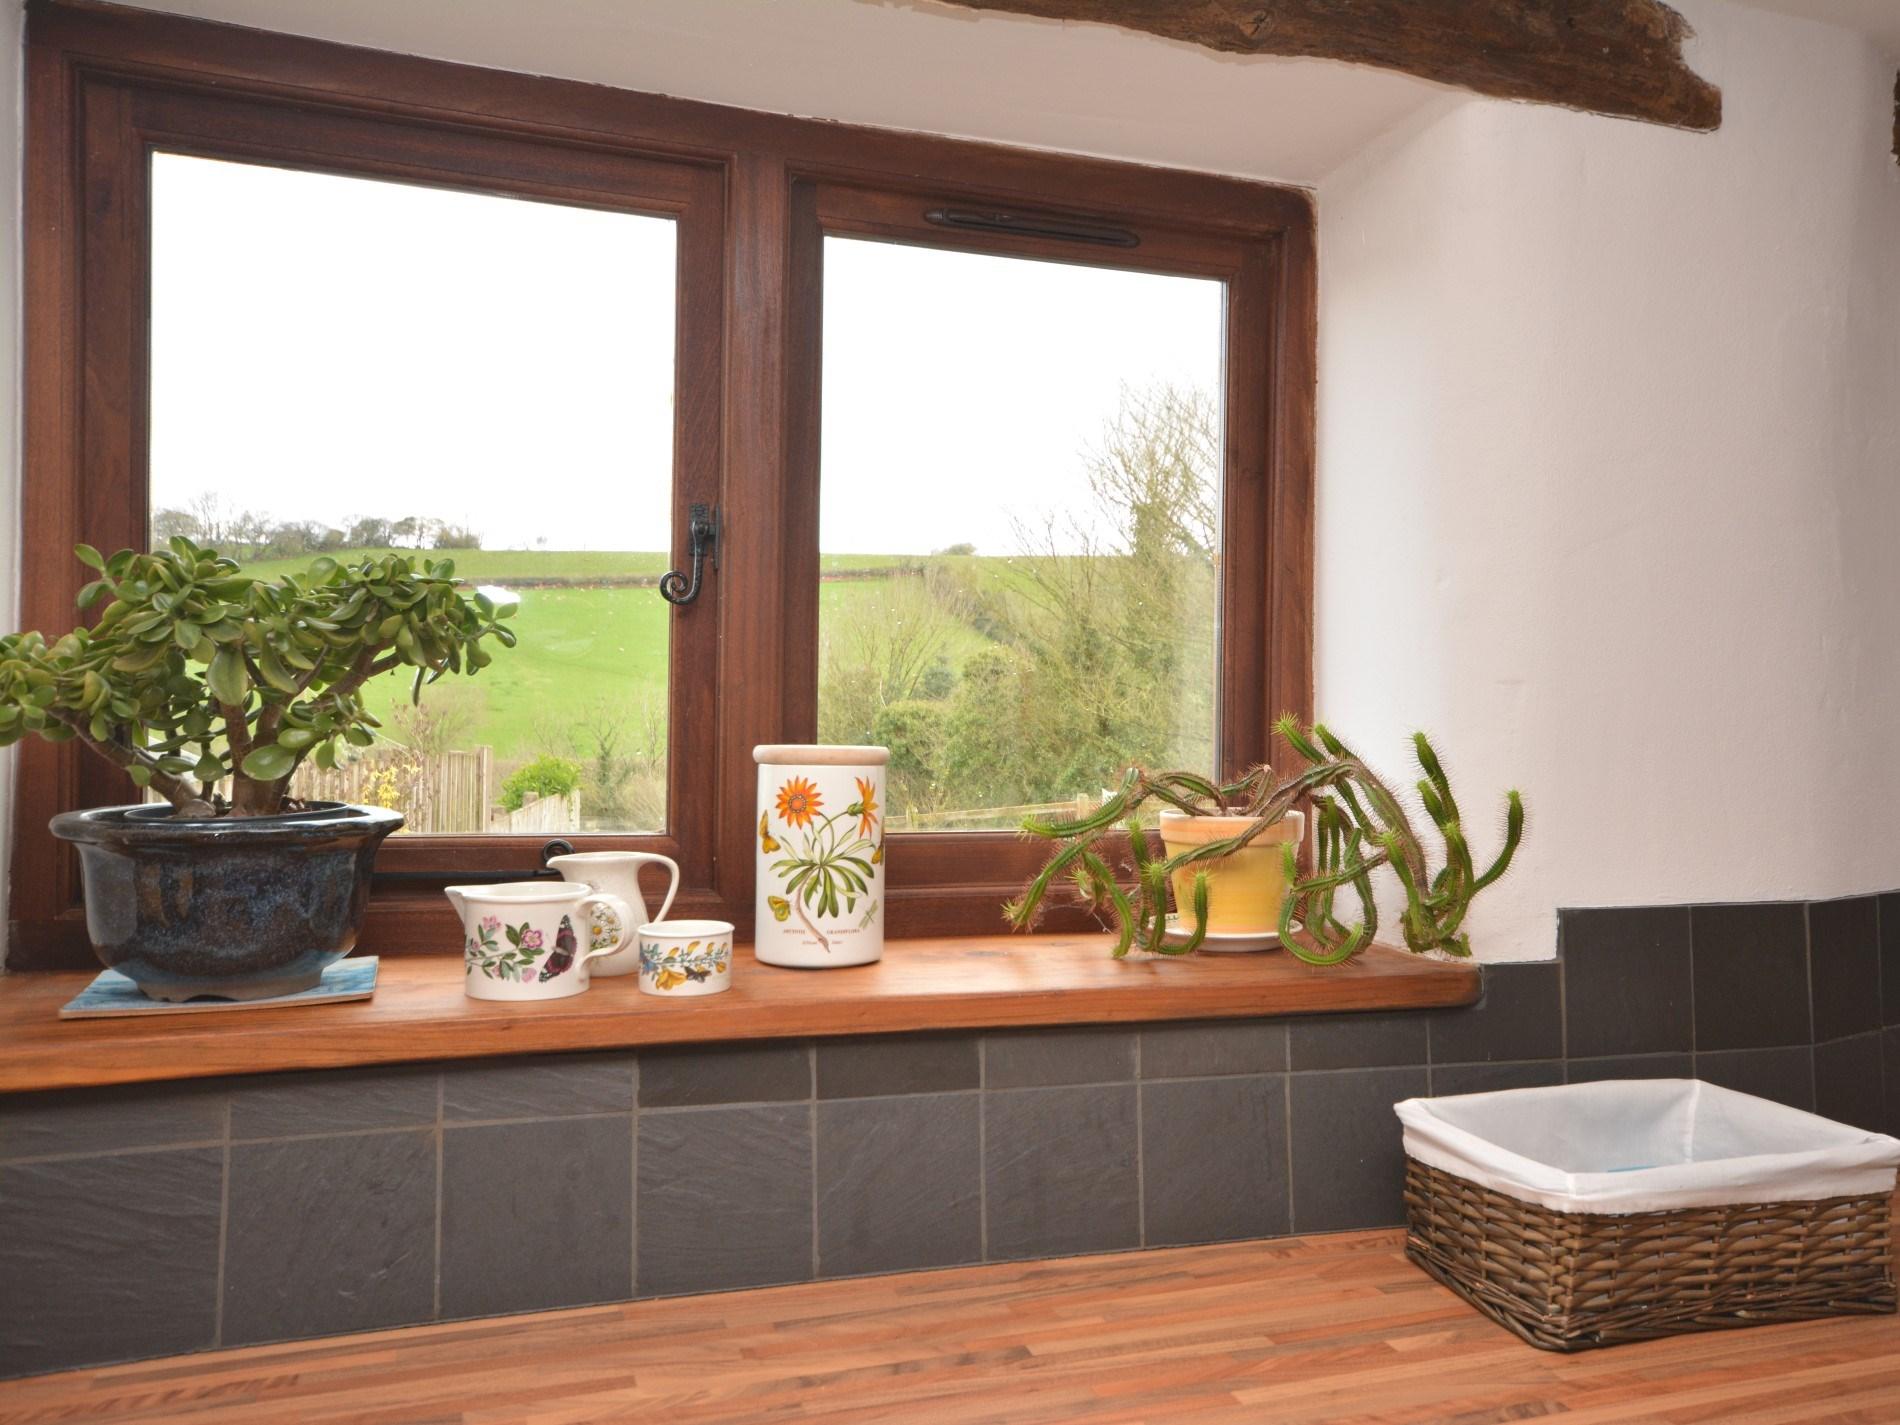 2 Bedroom Cottage in North Tawton, Devon